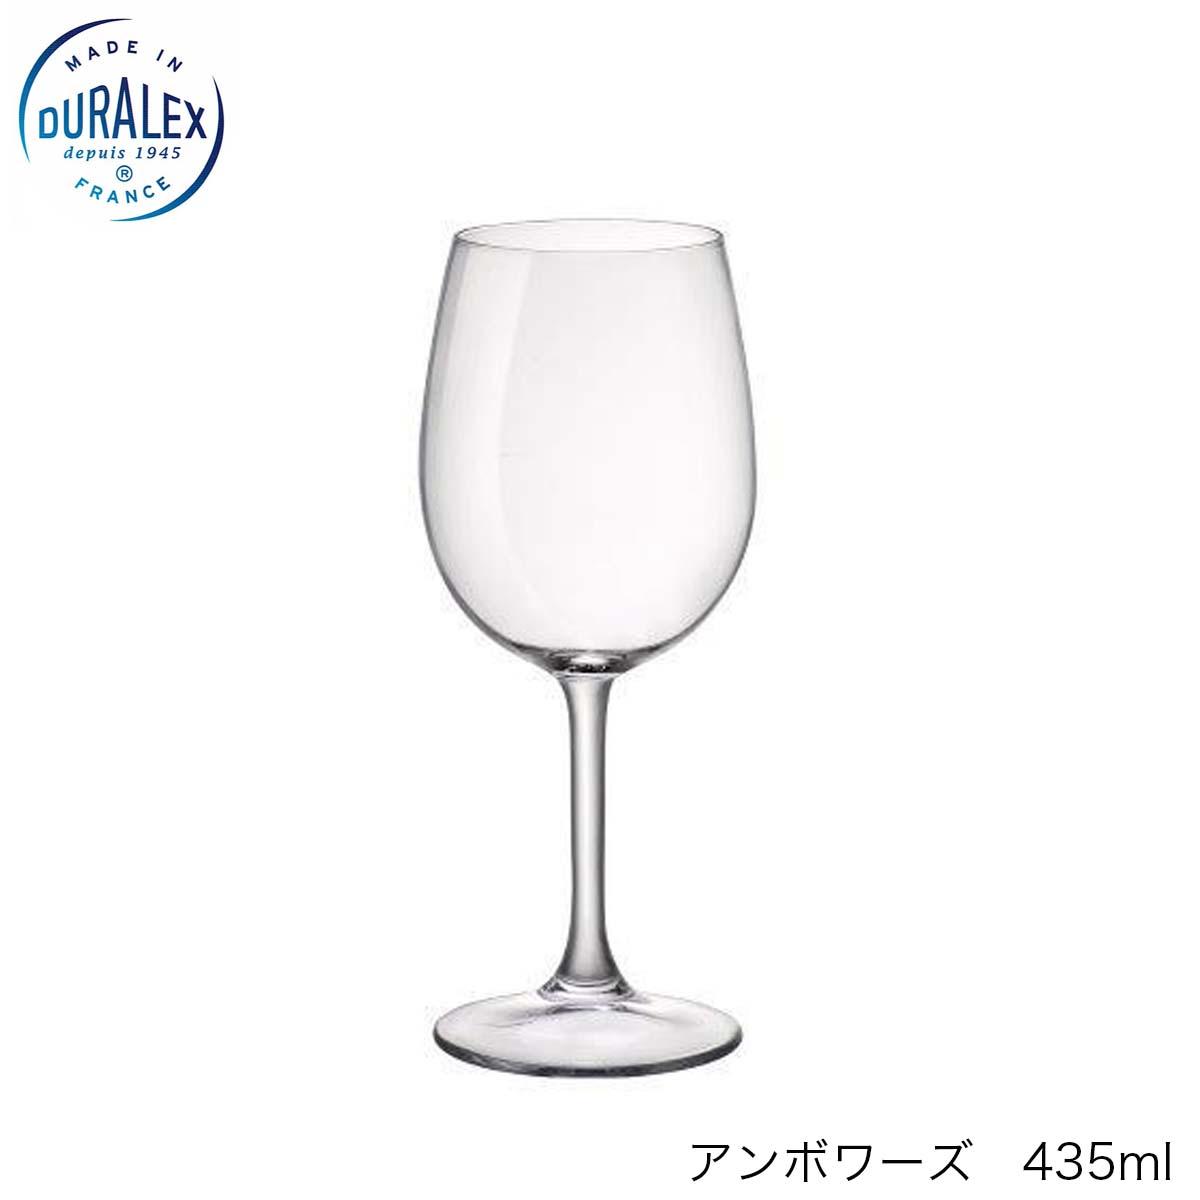 DURALEX デュラレックスアンボワーズワイングラス 435ml6個セット フランス製